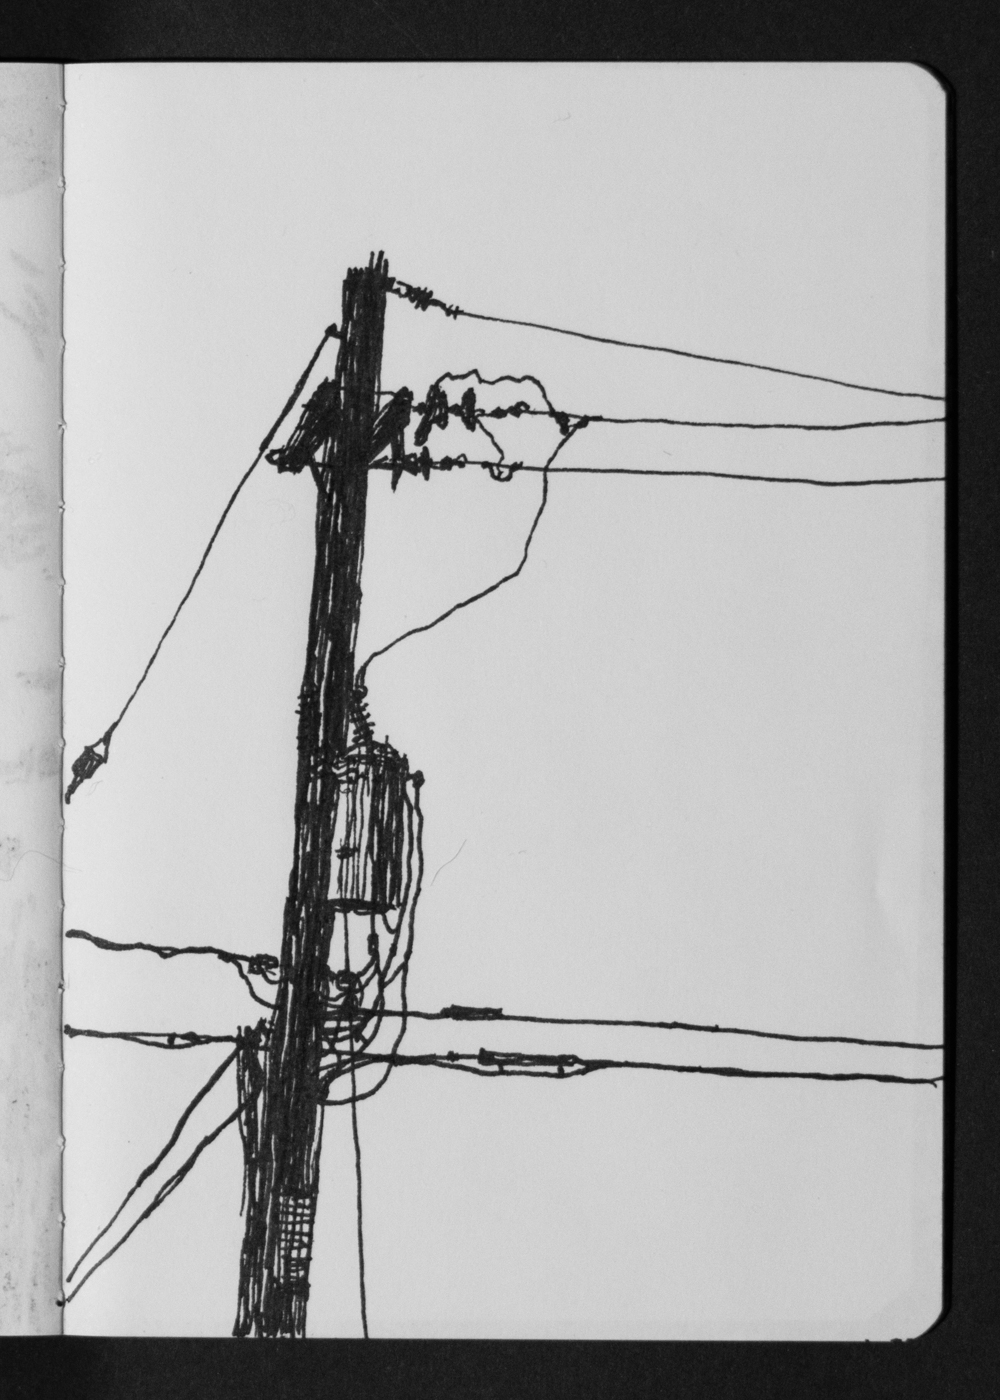 03-14 Transmission Post.jpg